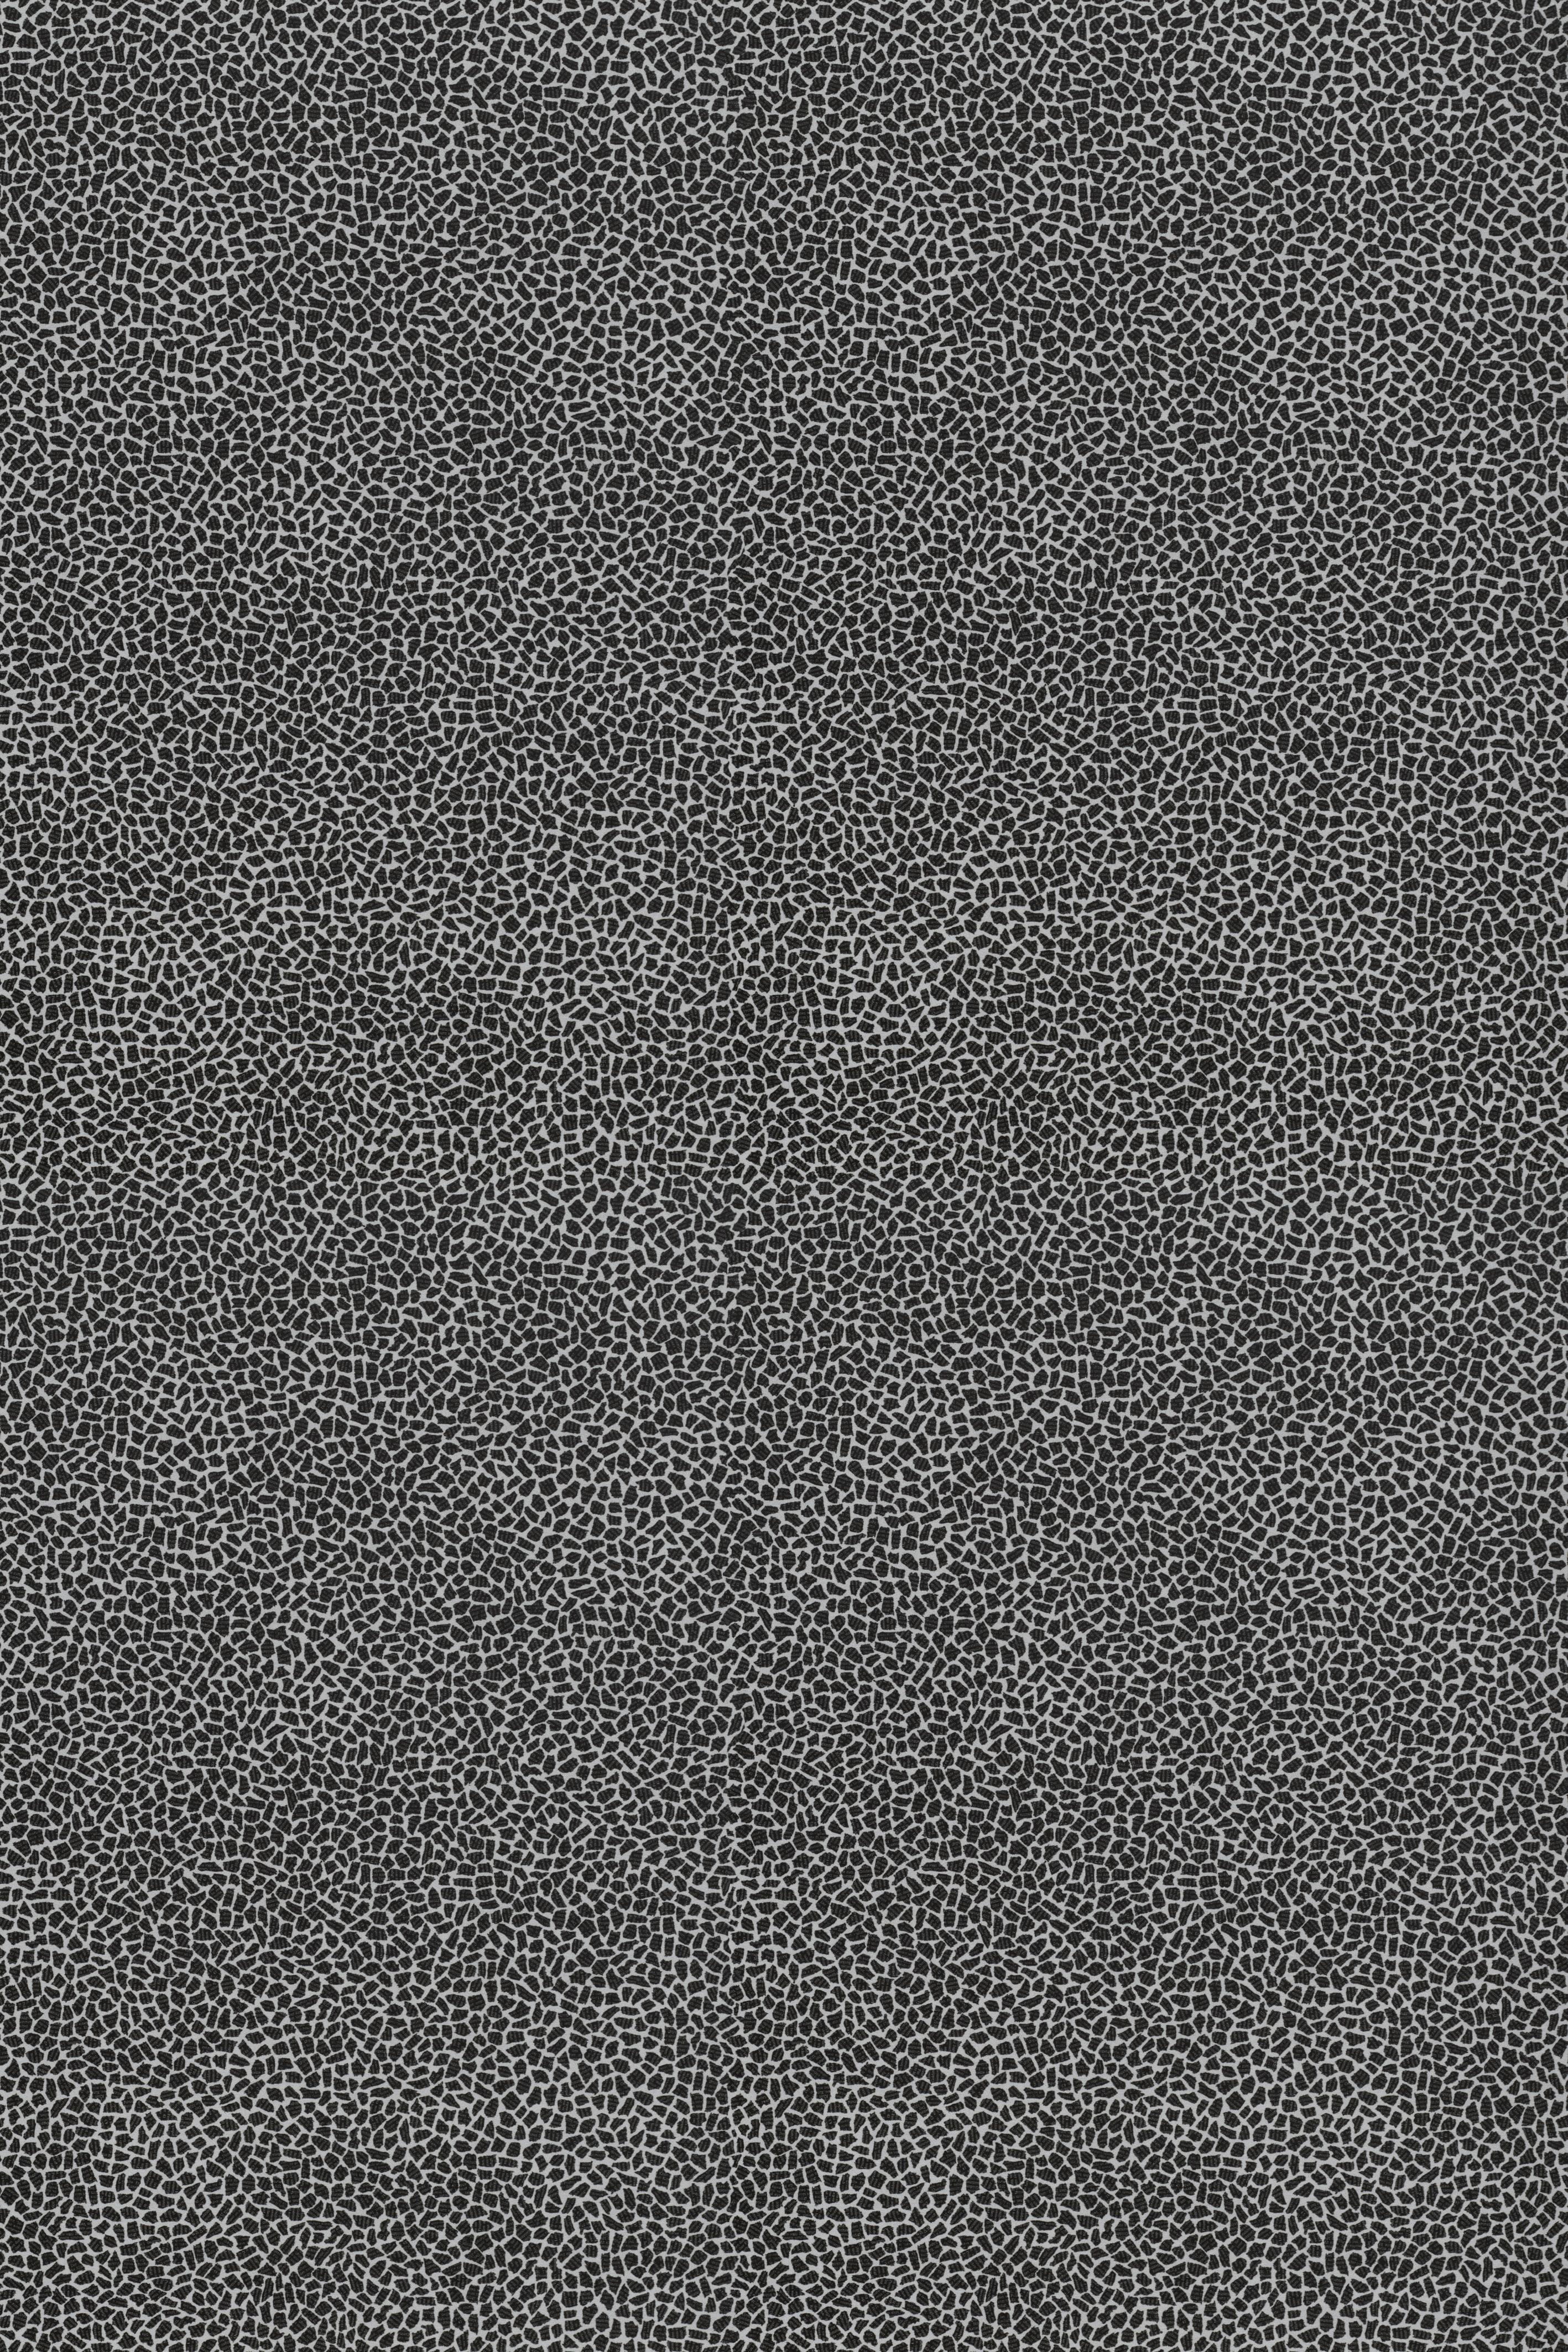 Flotex Terrazzo Flocked Flooring